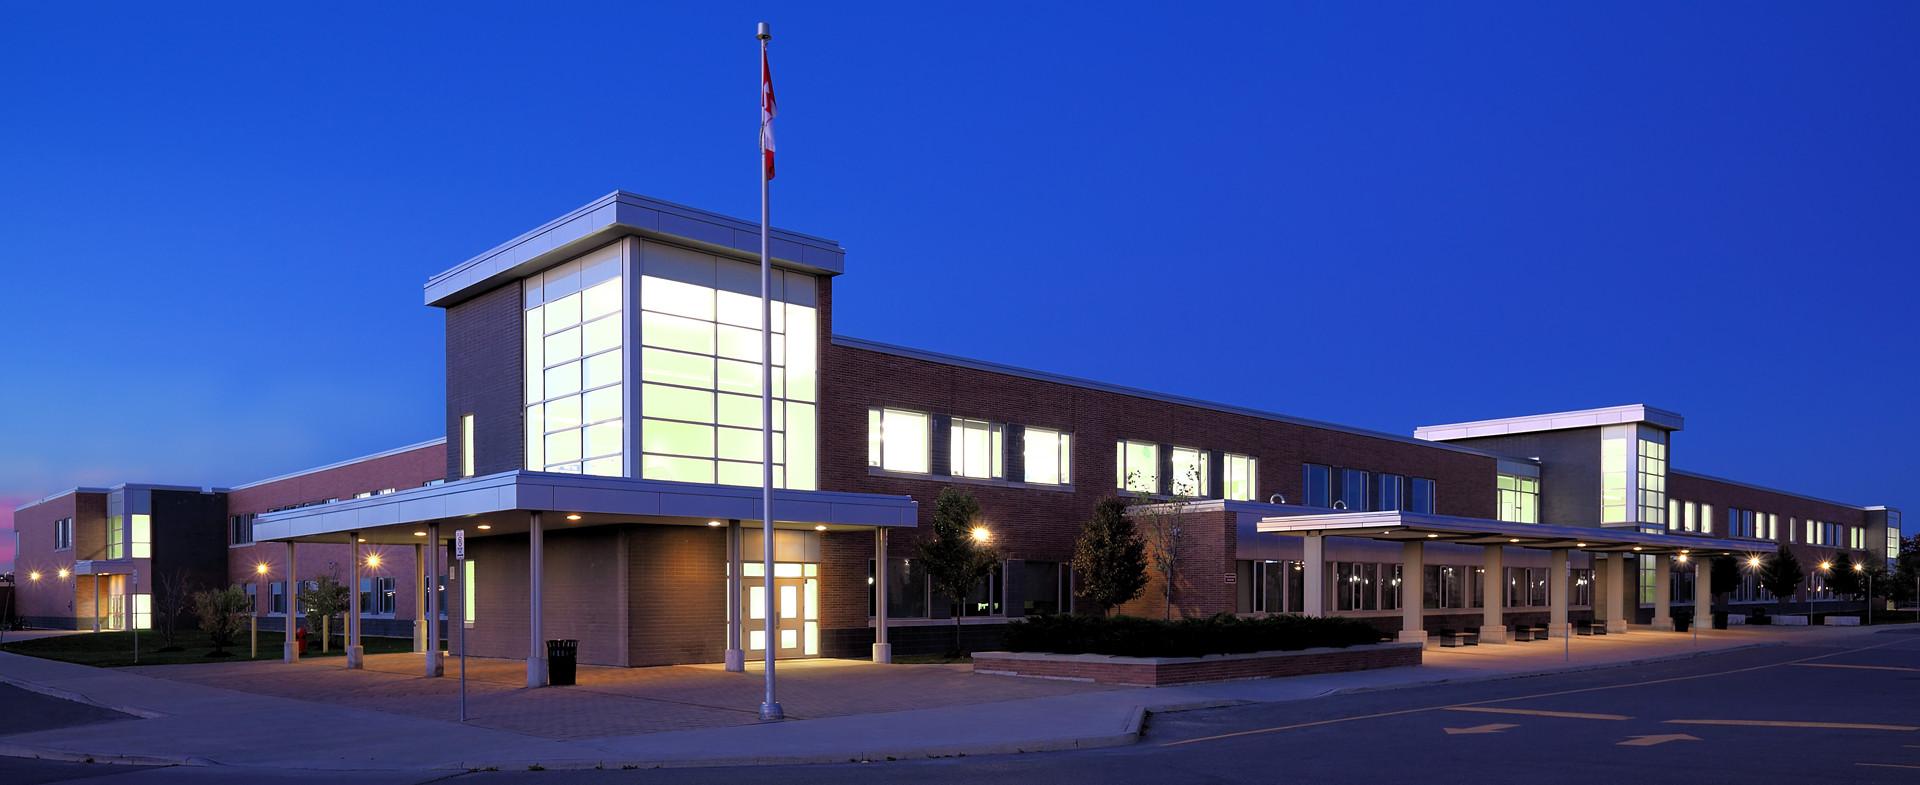 Maxwell-Heights-Secondary-School-1